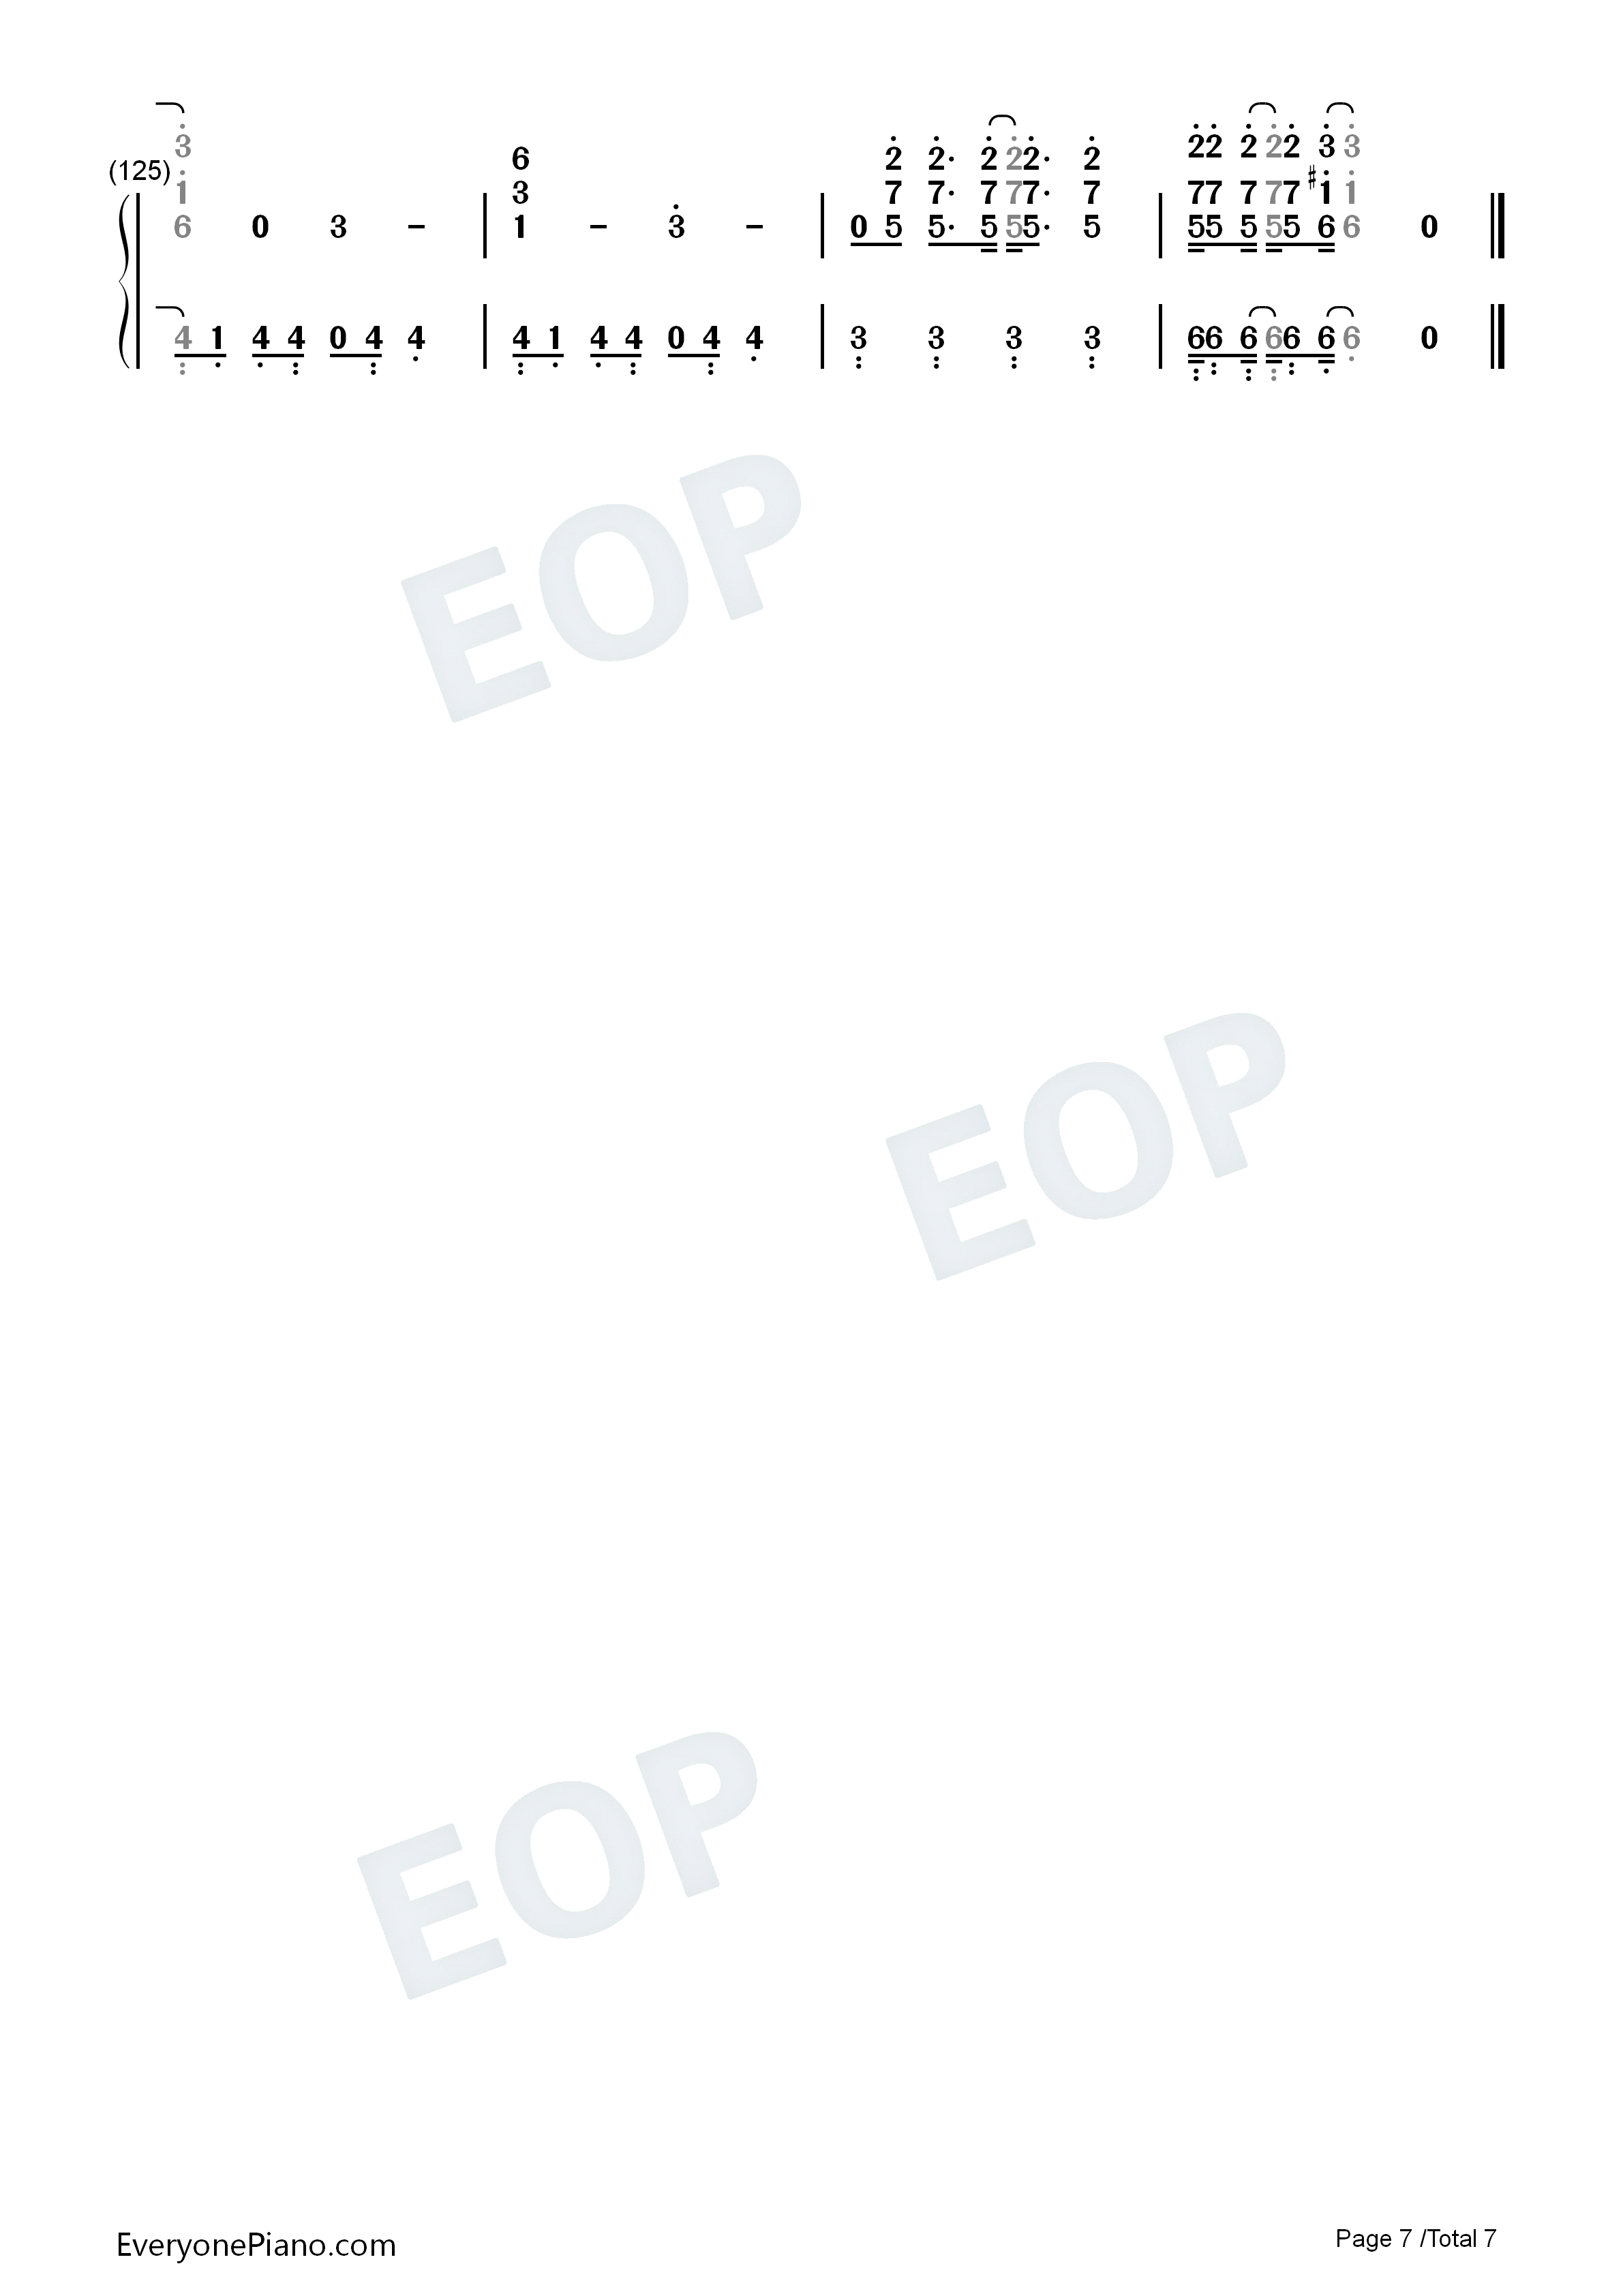 钢琴曲谱 流行 step and go-岚 step and go-岚双手简谱预览7  }